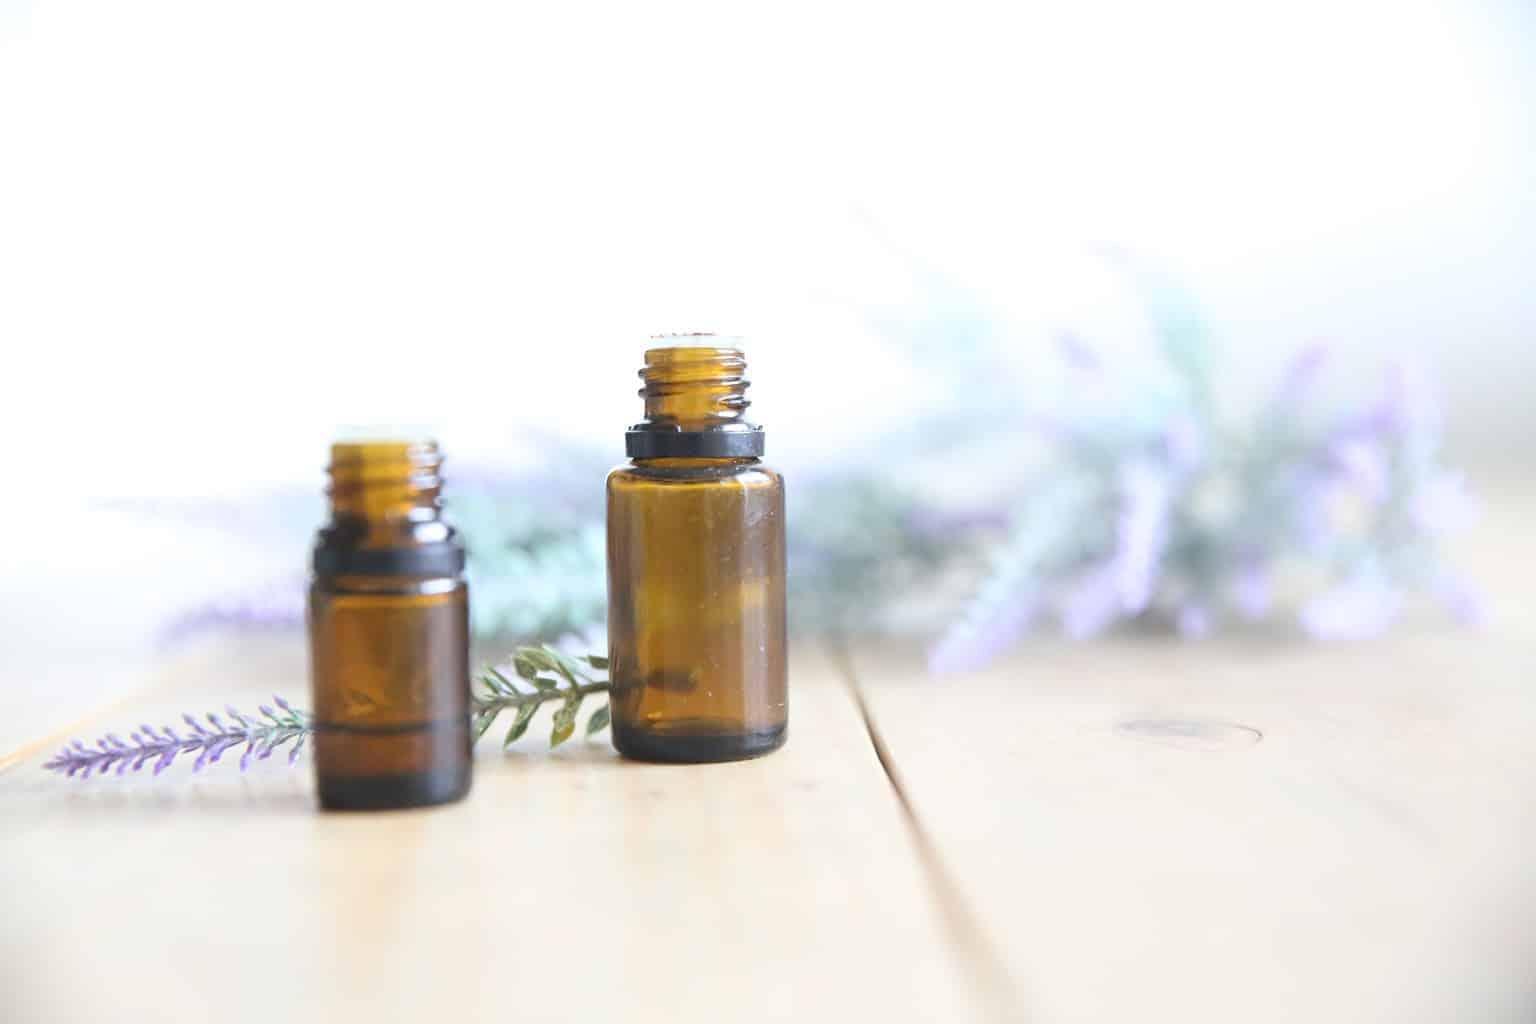 glass amber colored lavender essential oil dropper bottles